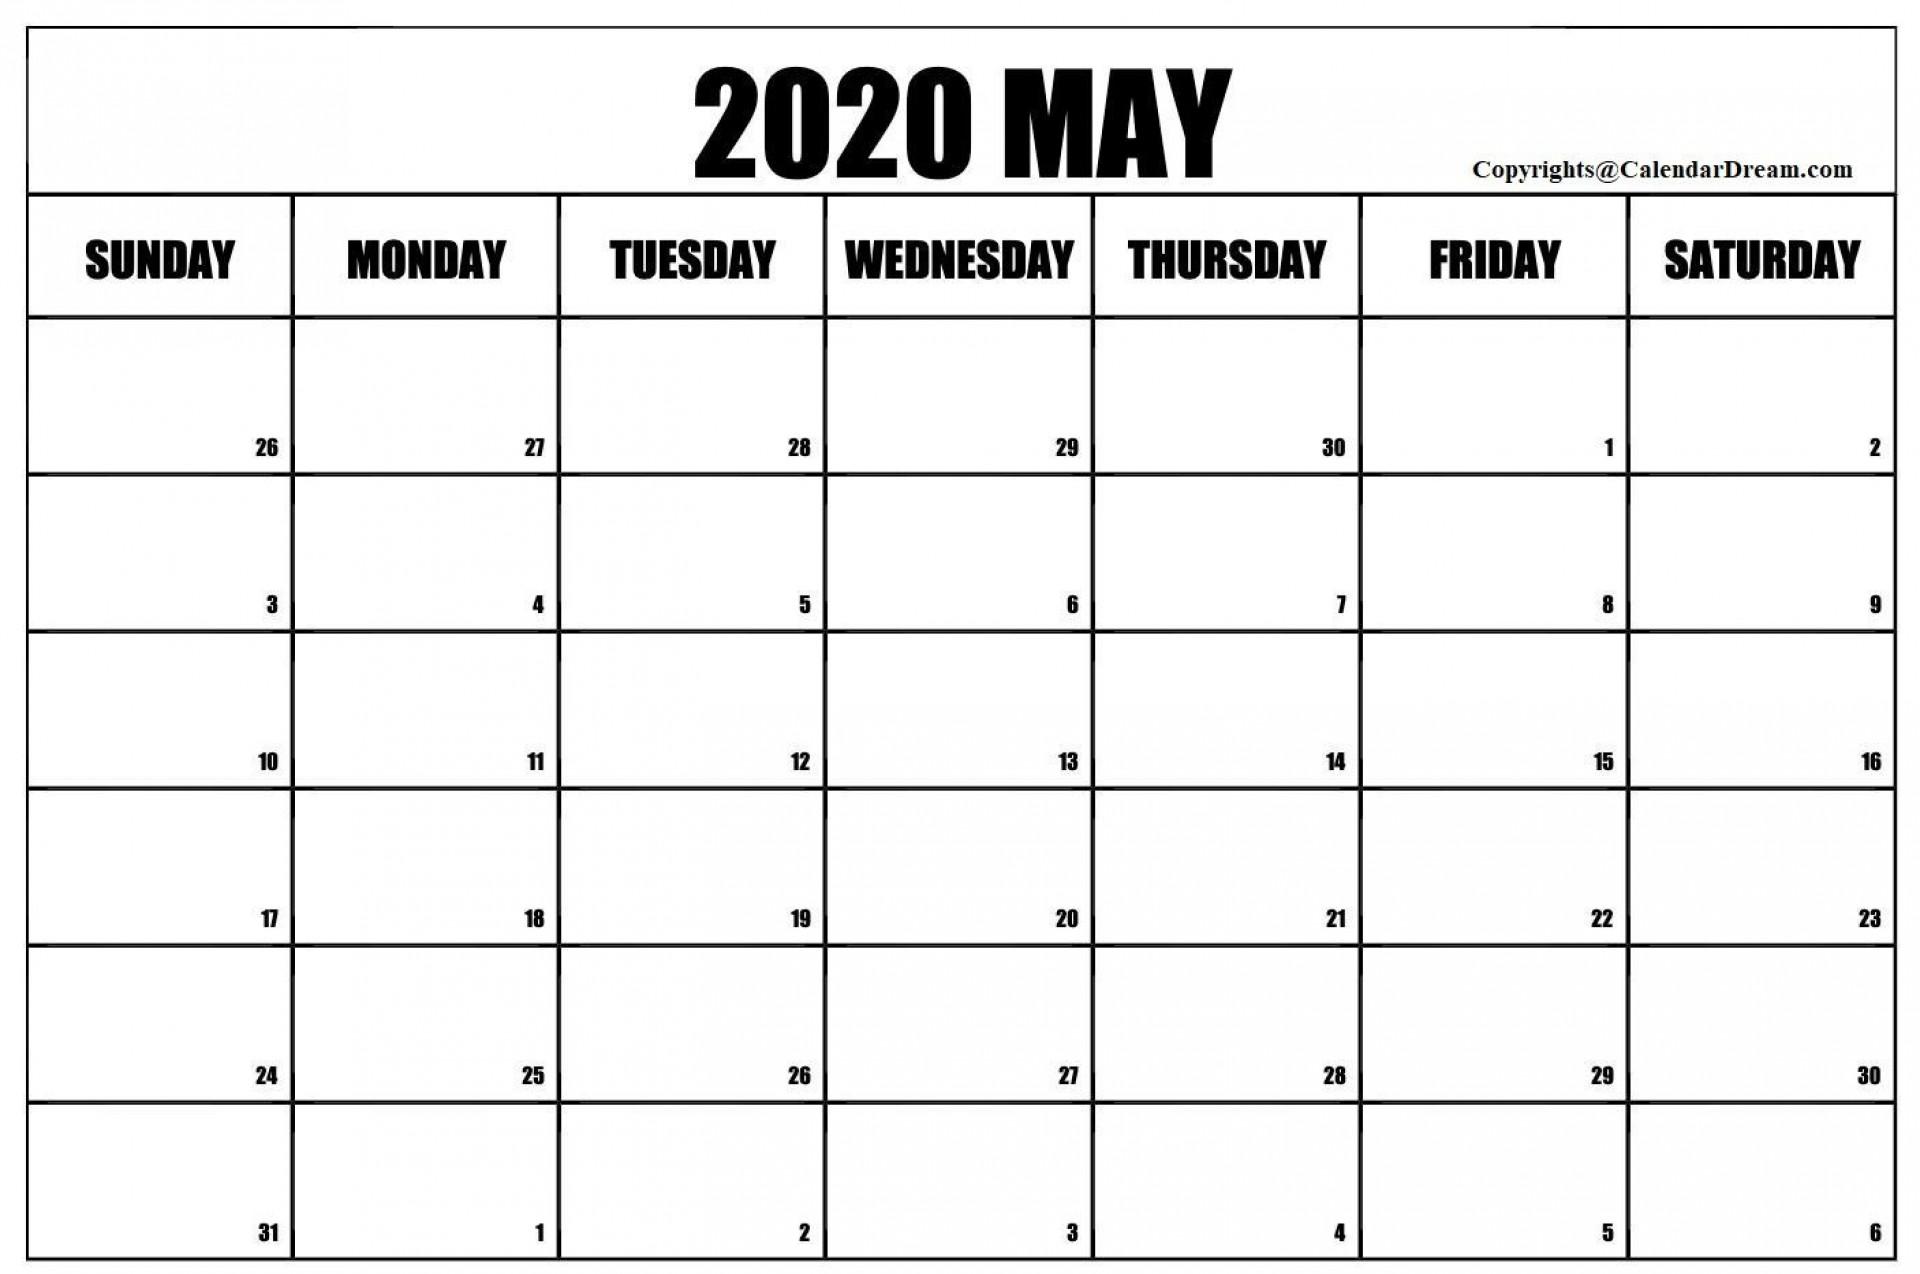 009 Impressive Blank Calendar Template Pdf High Resolution  Free Yearly1920